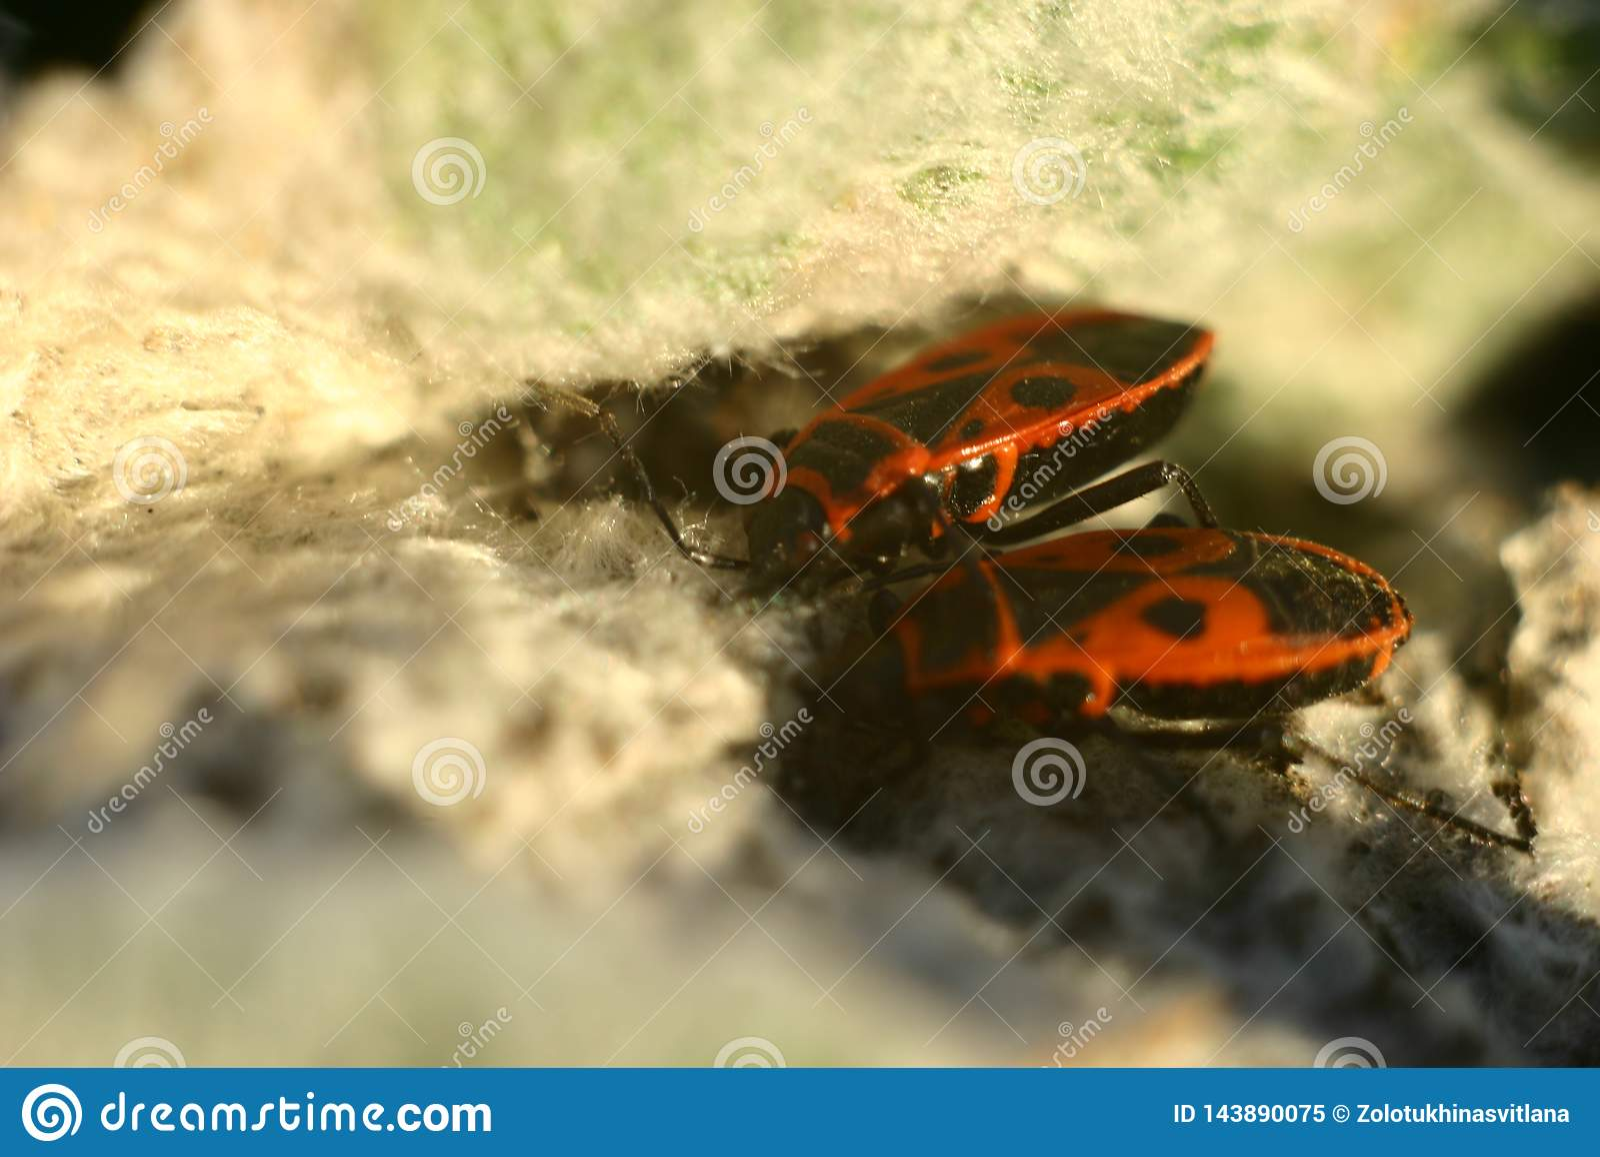 Lage diepte van gebied Leuke heldere rode en zwarte kever Dit is een wingless rood insect of soldier's insect